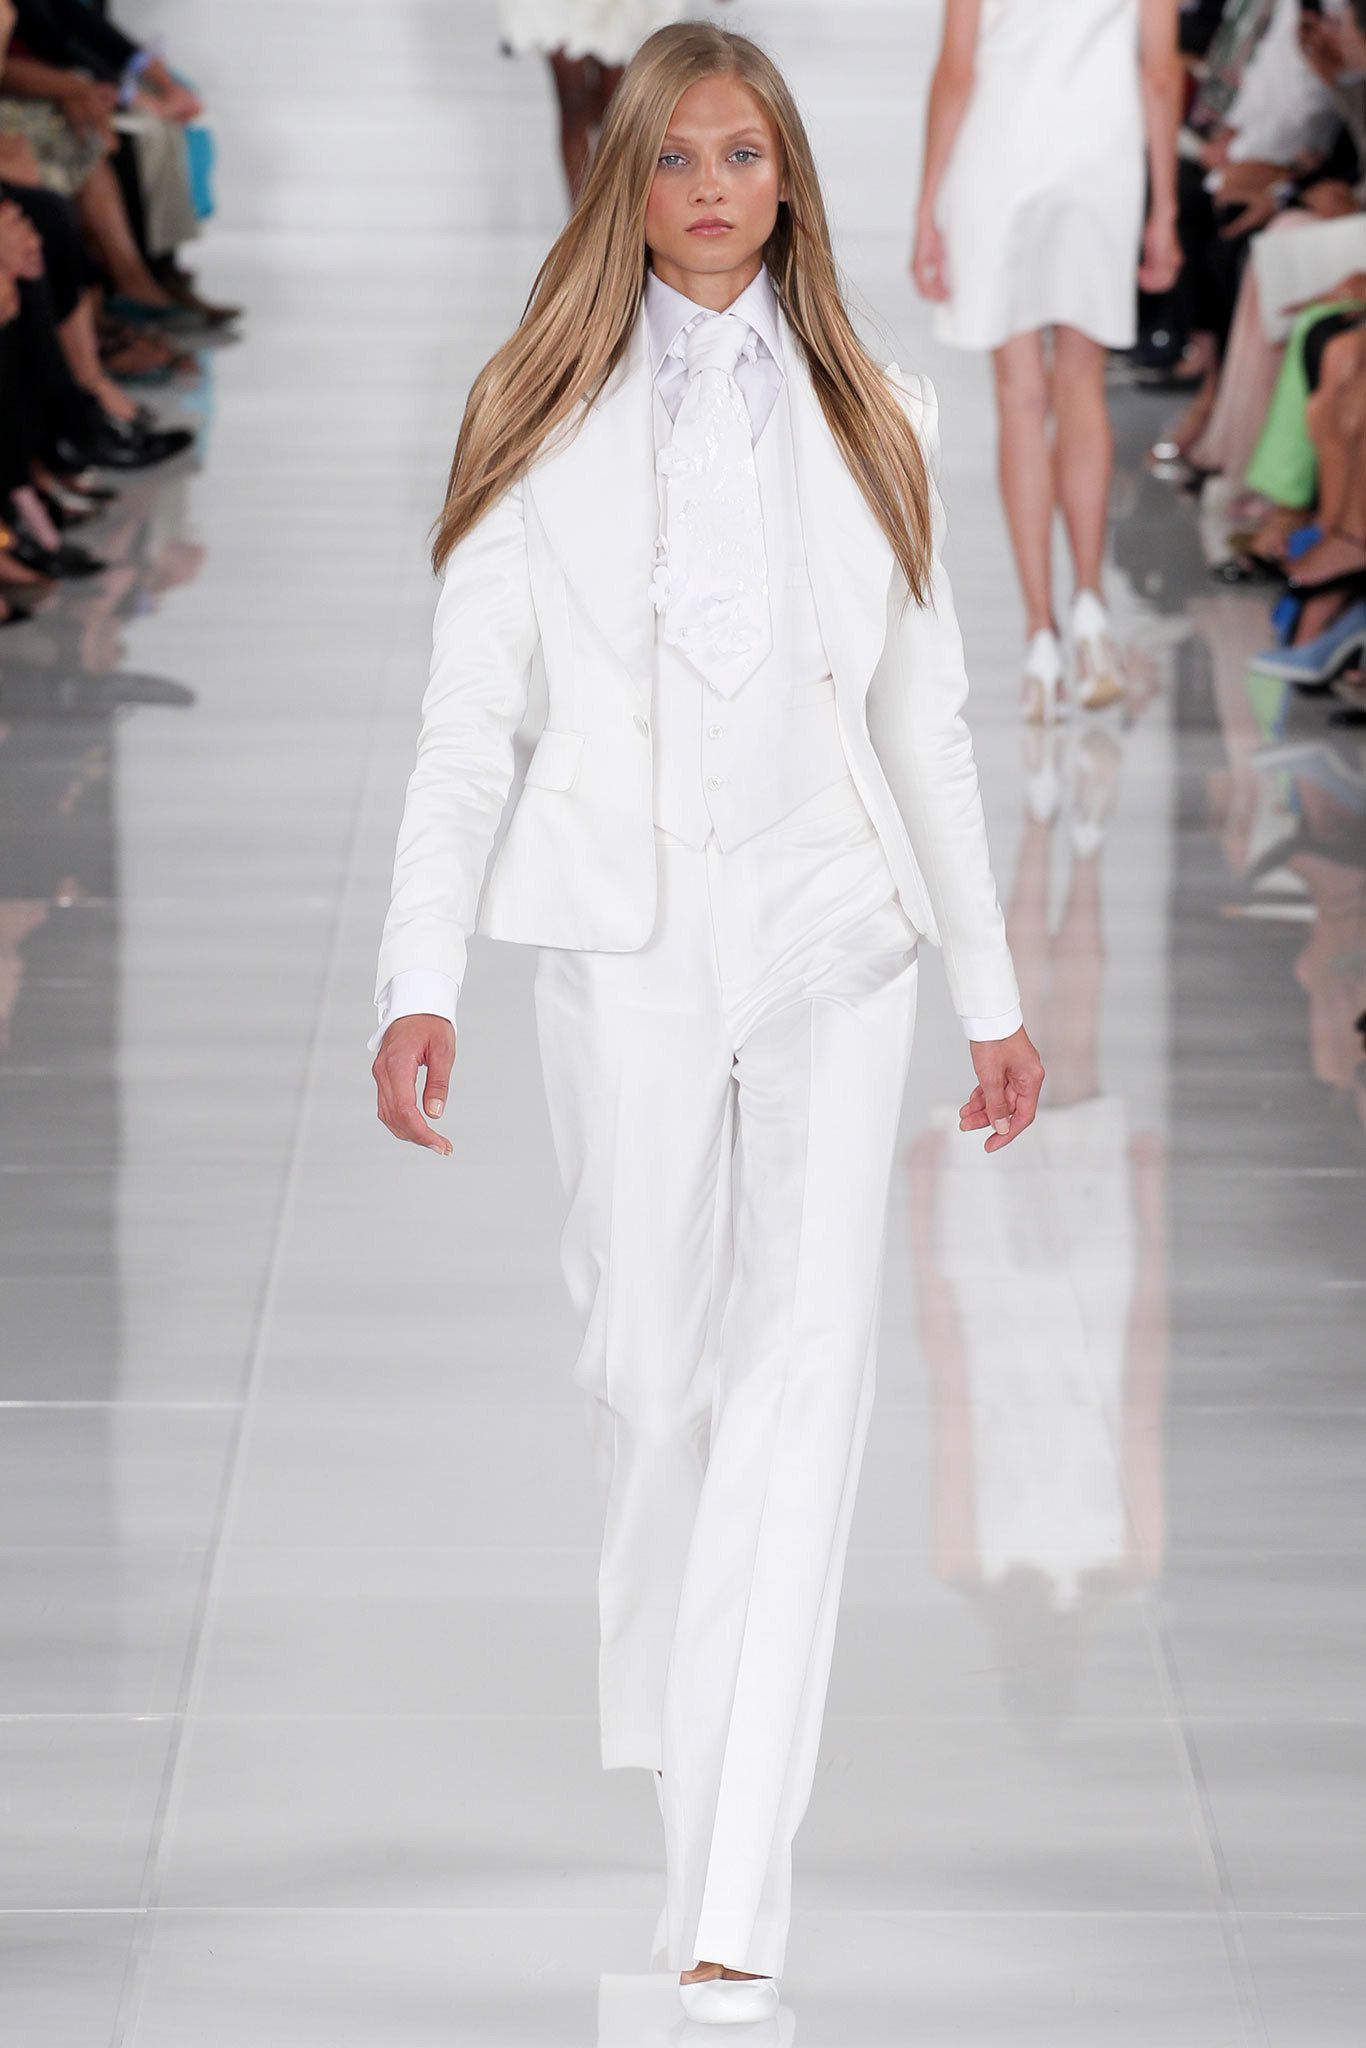 Ralph Lauren Spring 2014 Ready-to-Wear Fashion Show - Anna Selezneva